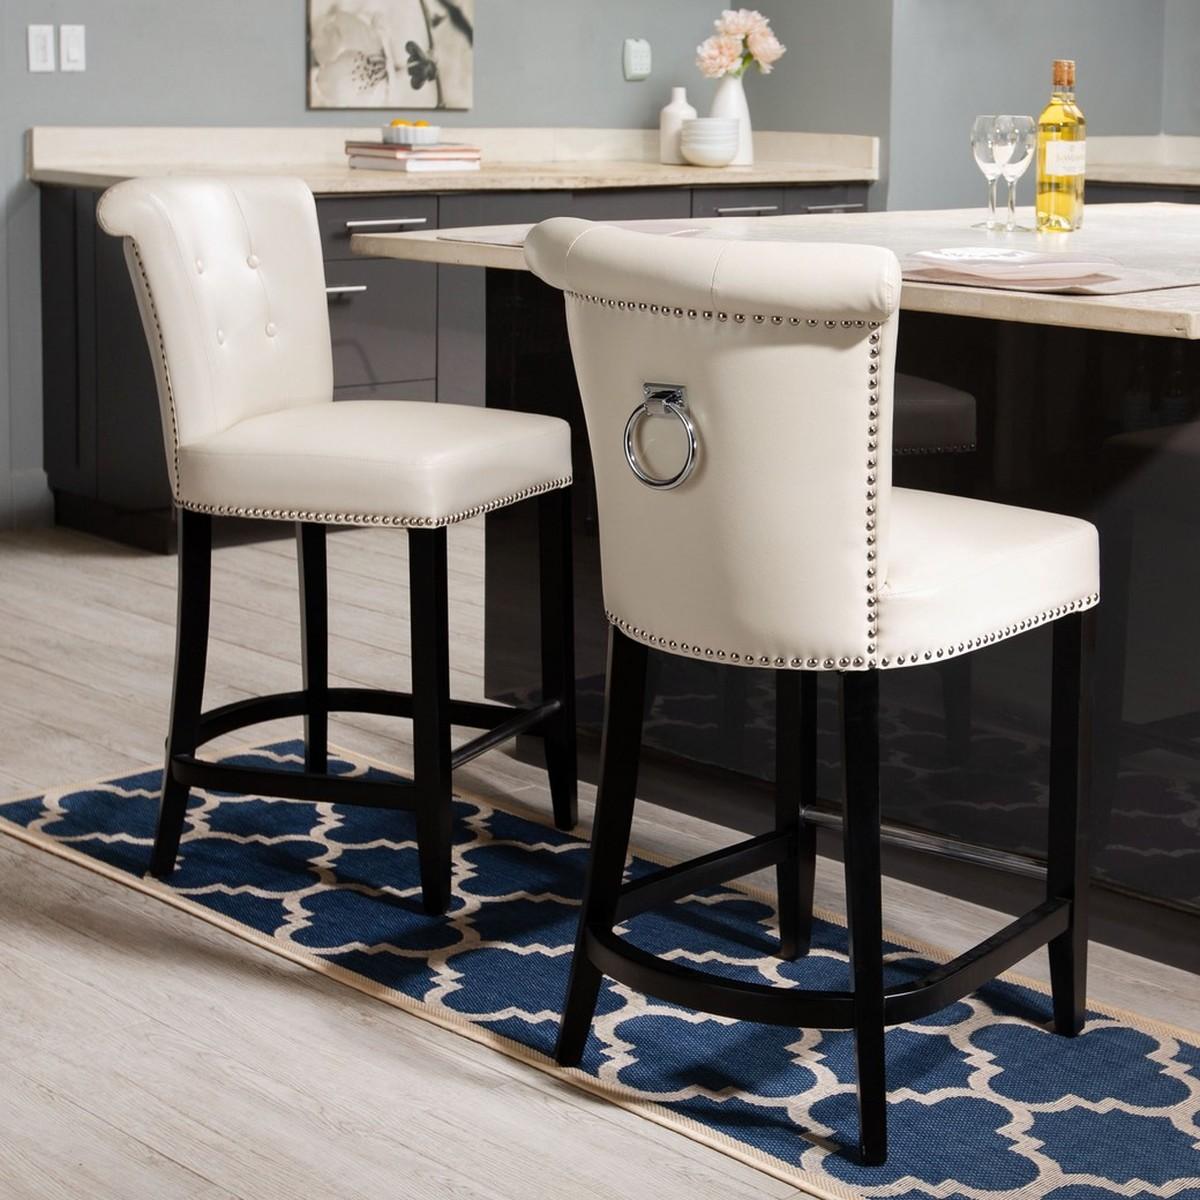 Phenomenal Hud8241D Counter Stools Furniture By Safavieh Creativecarmelina Interior Chair Design Creativecarmelinacom